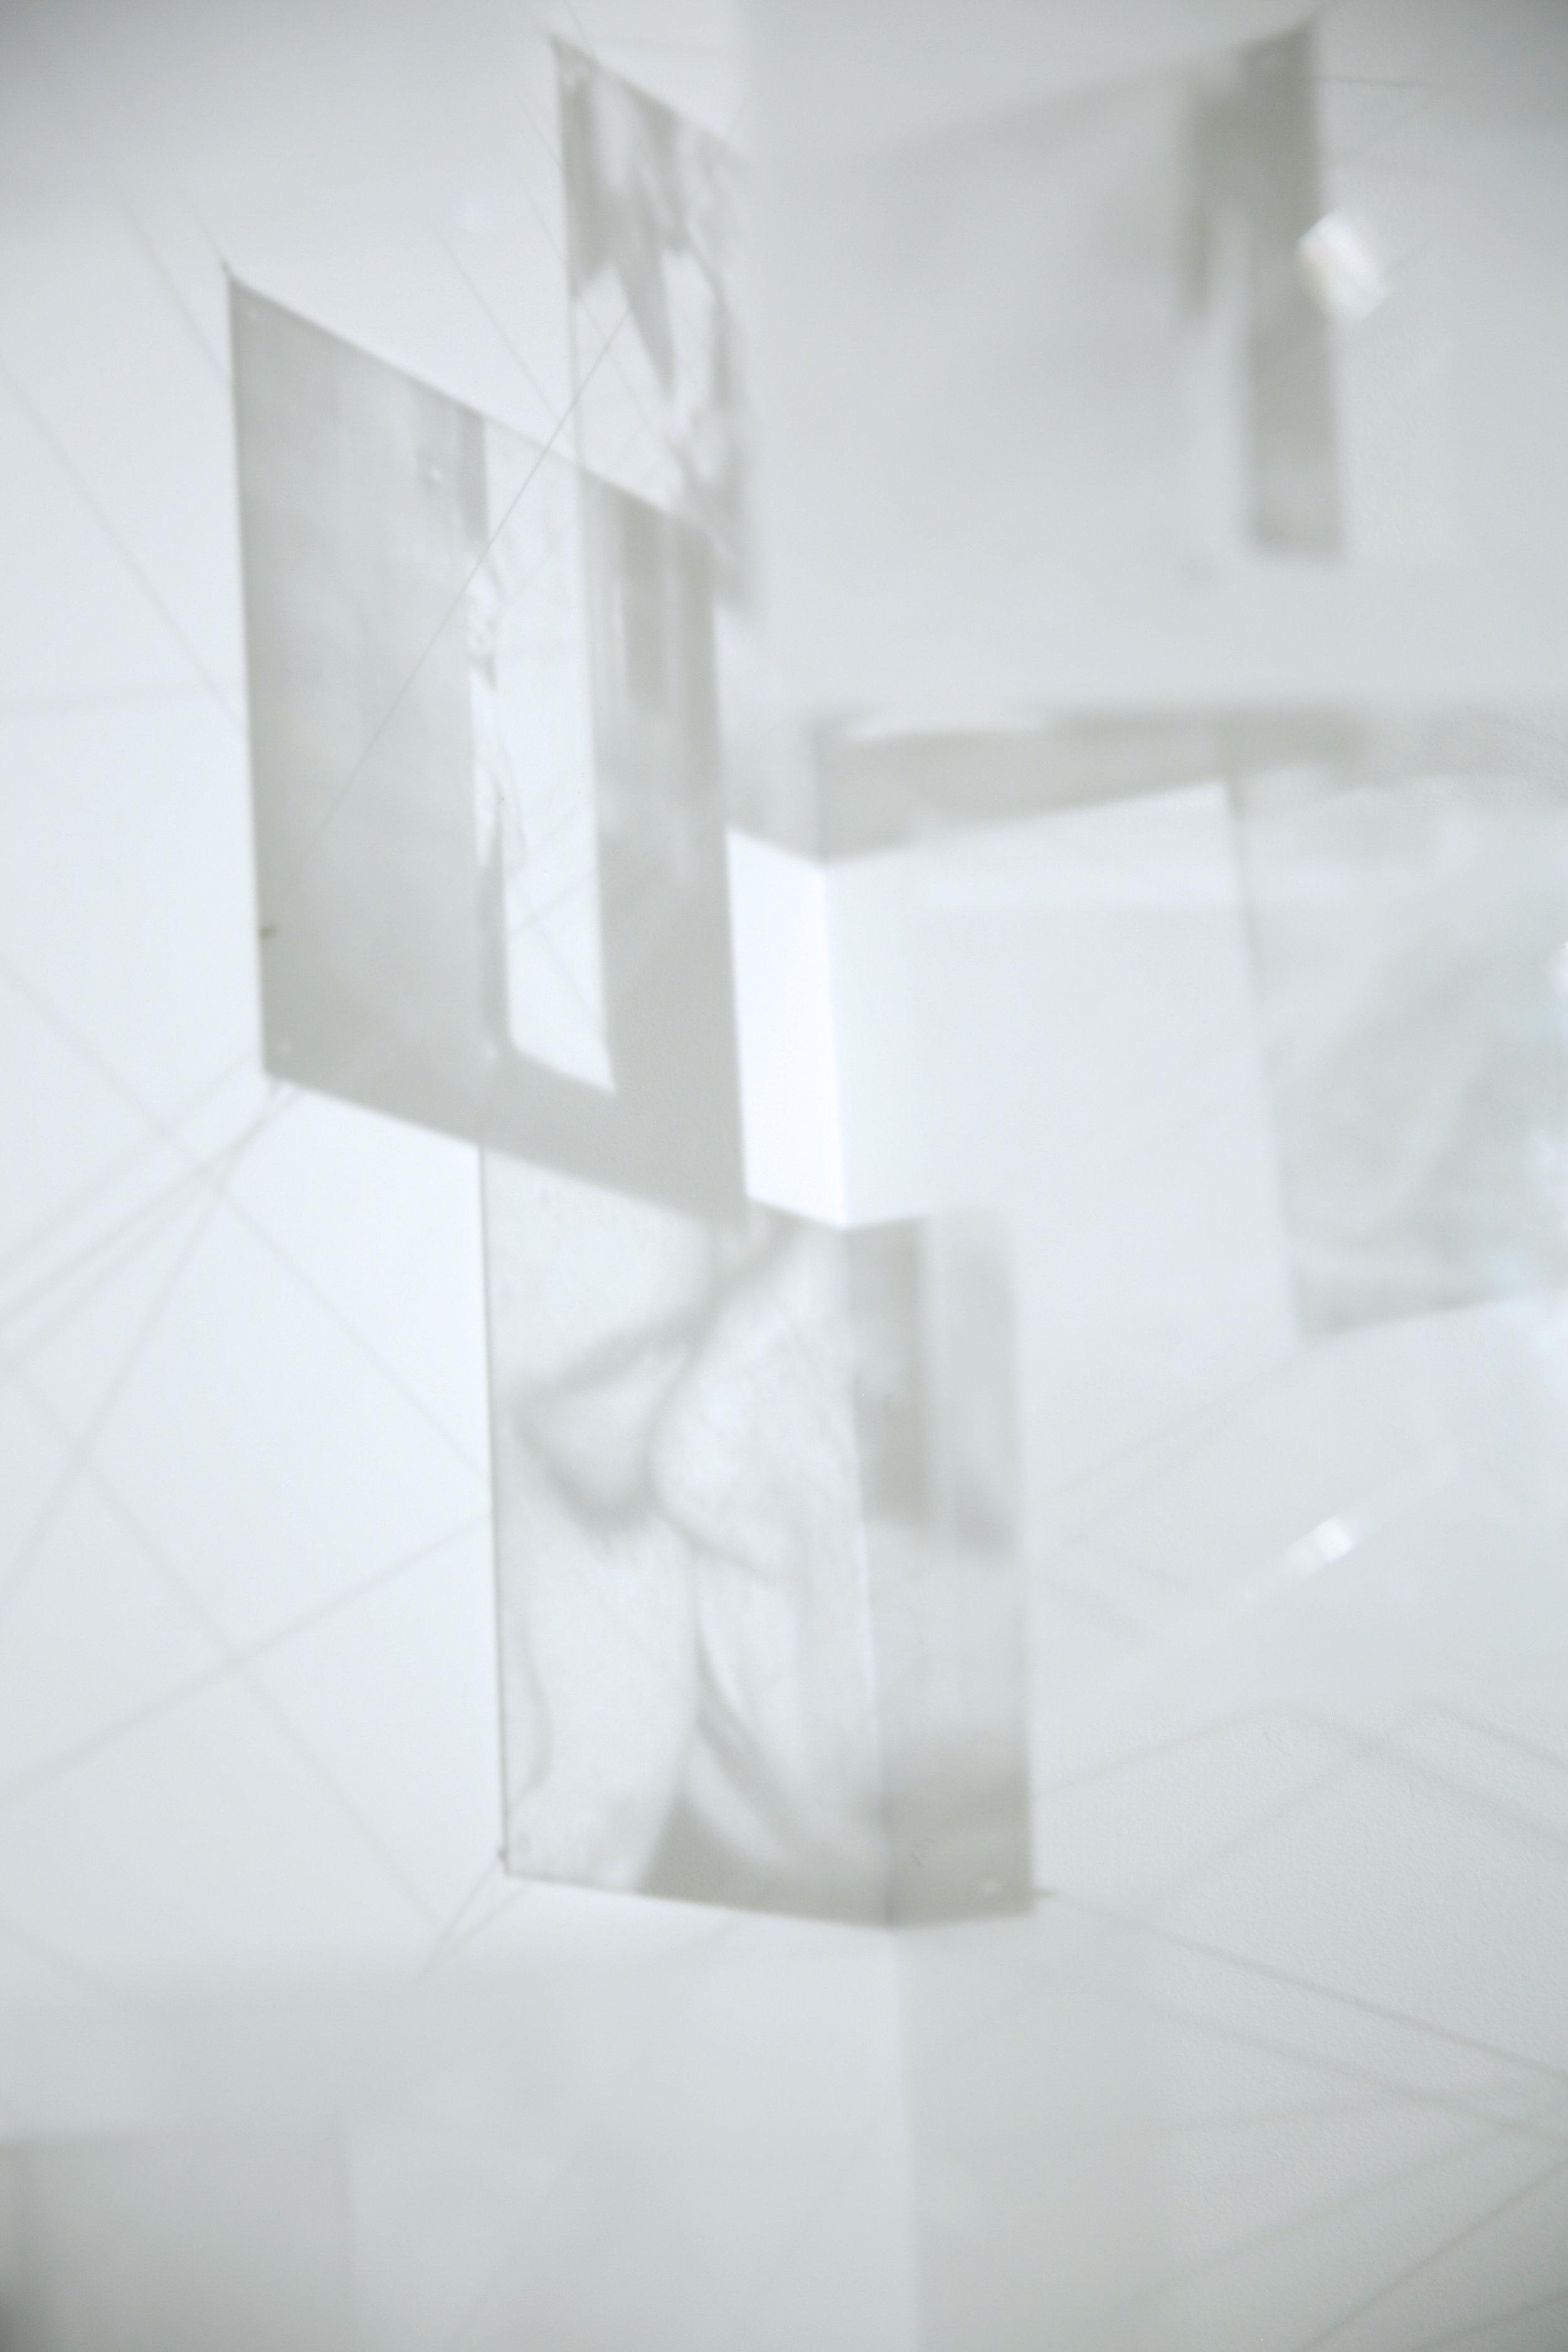 Girardello_M_Installation-7b.jpg